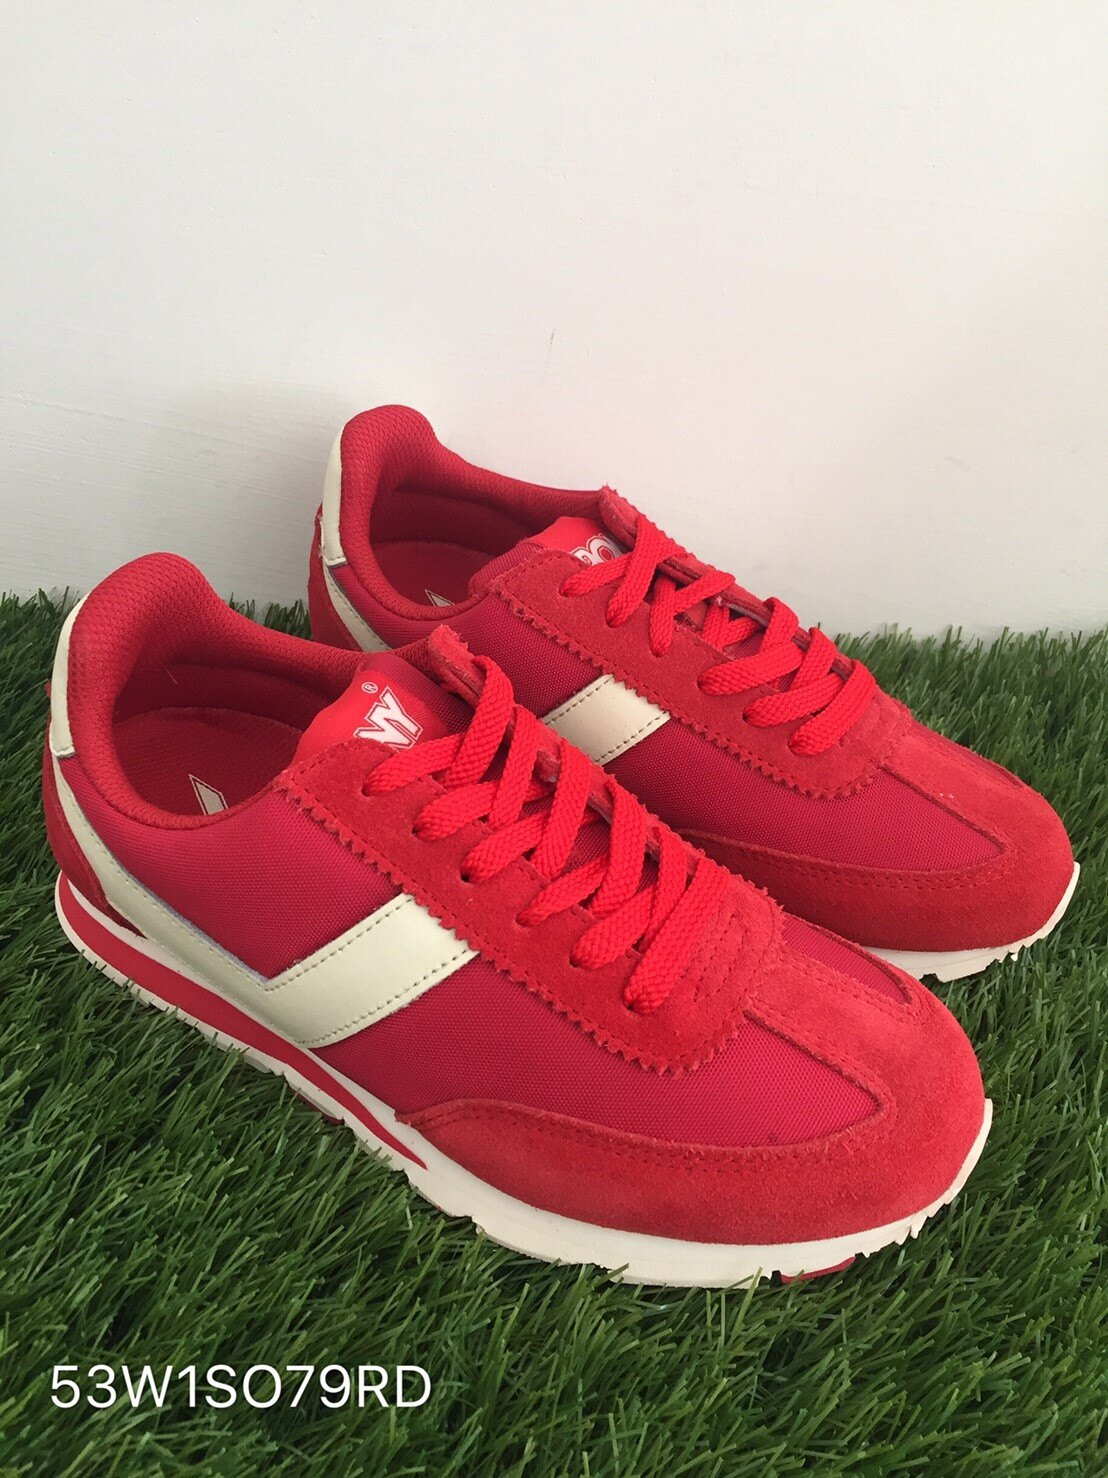 [25cm]★限時特價990元★ Shoestw【53W1SO79RD】PONY 復古慢跑鞋 內增高 紅白色 女生 0